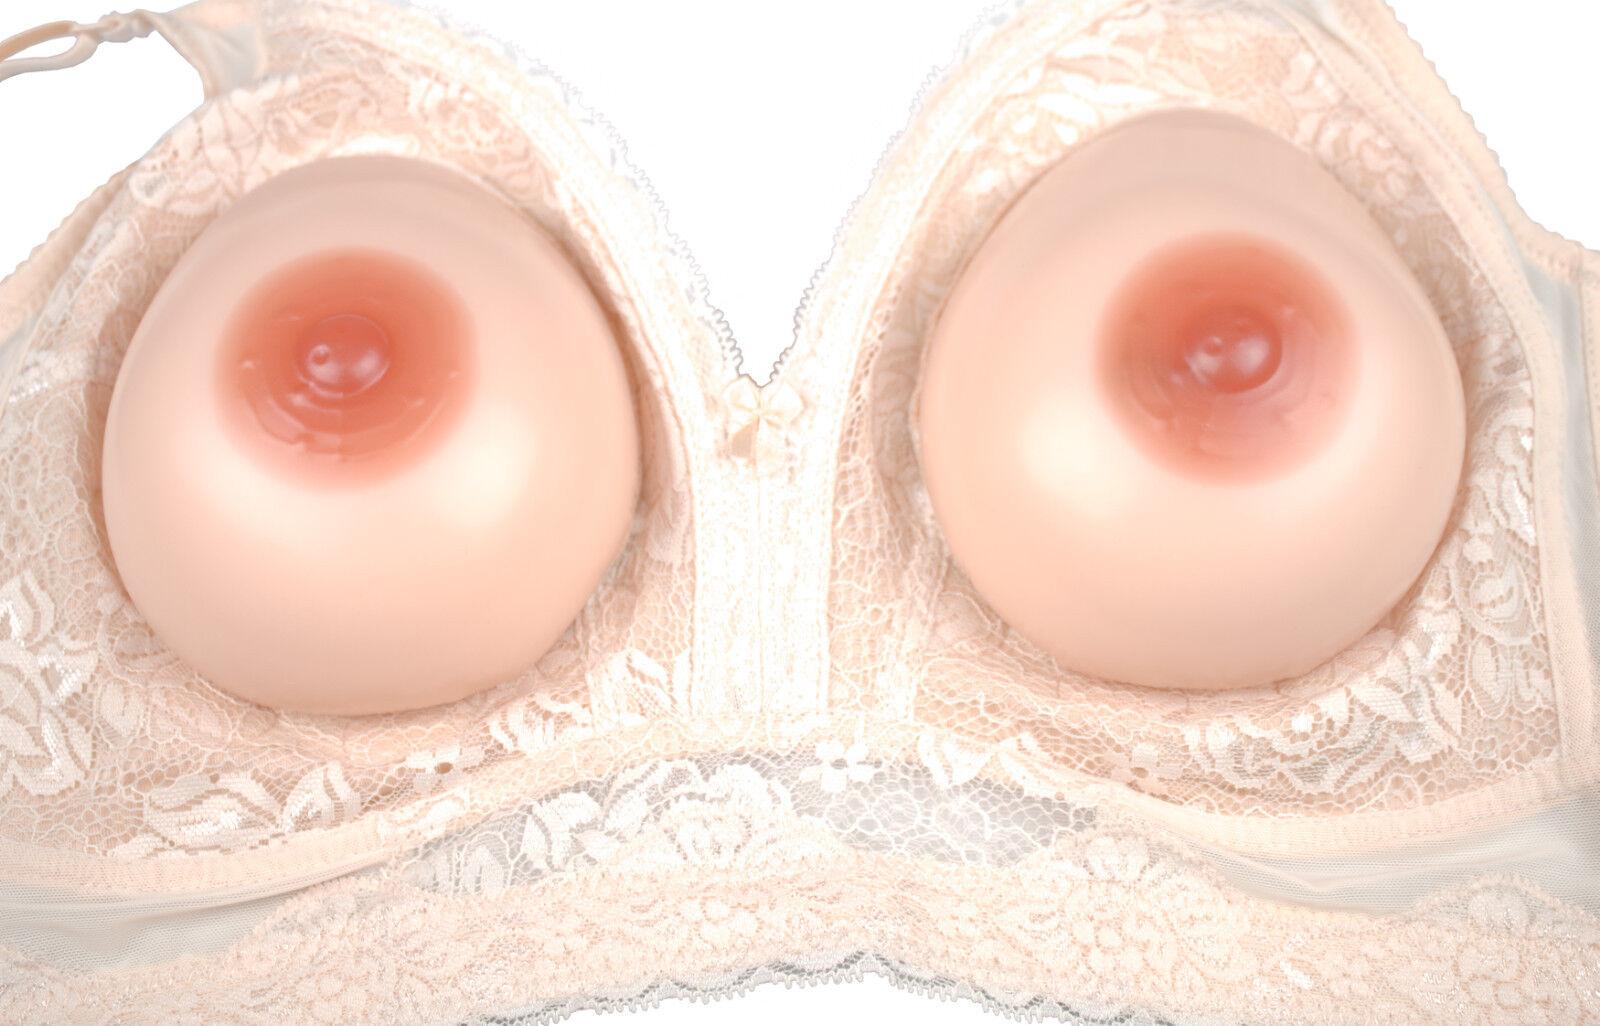 E brüste